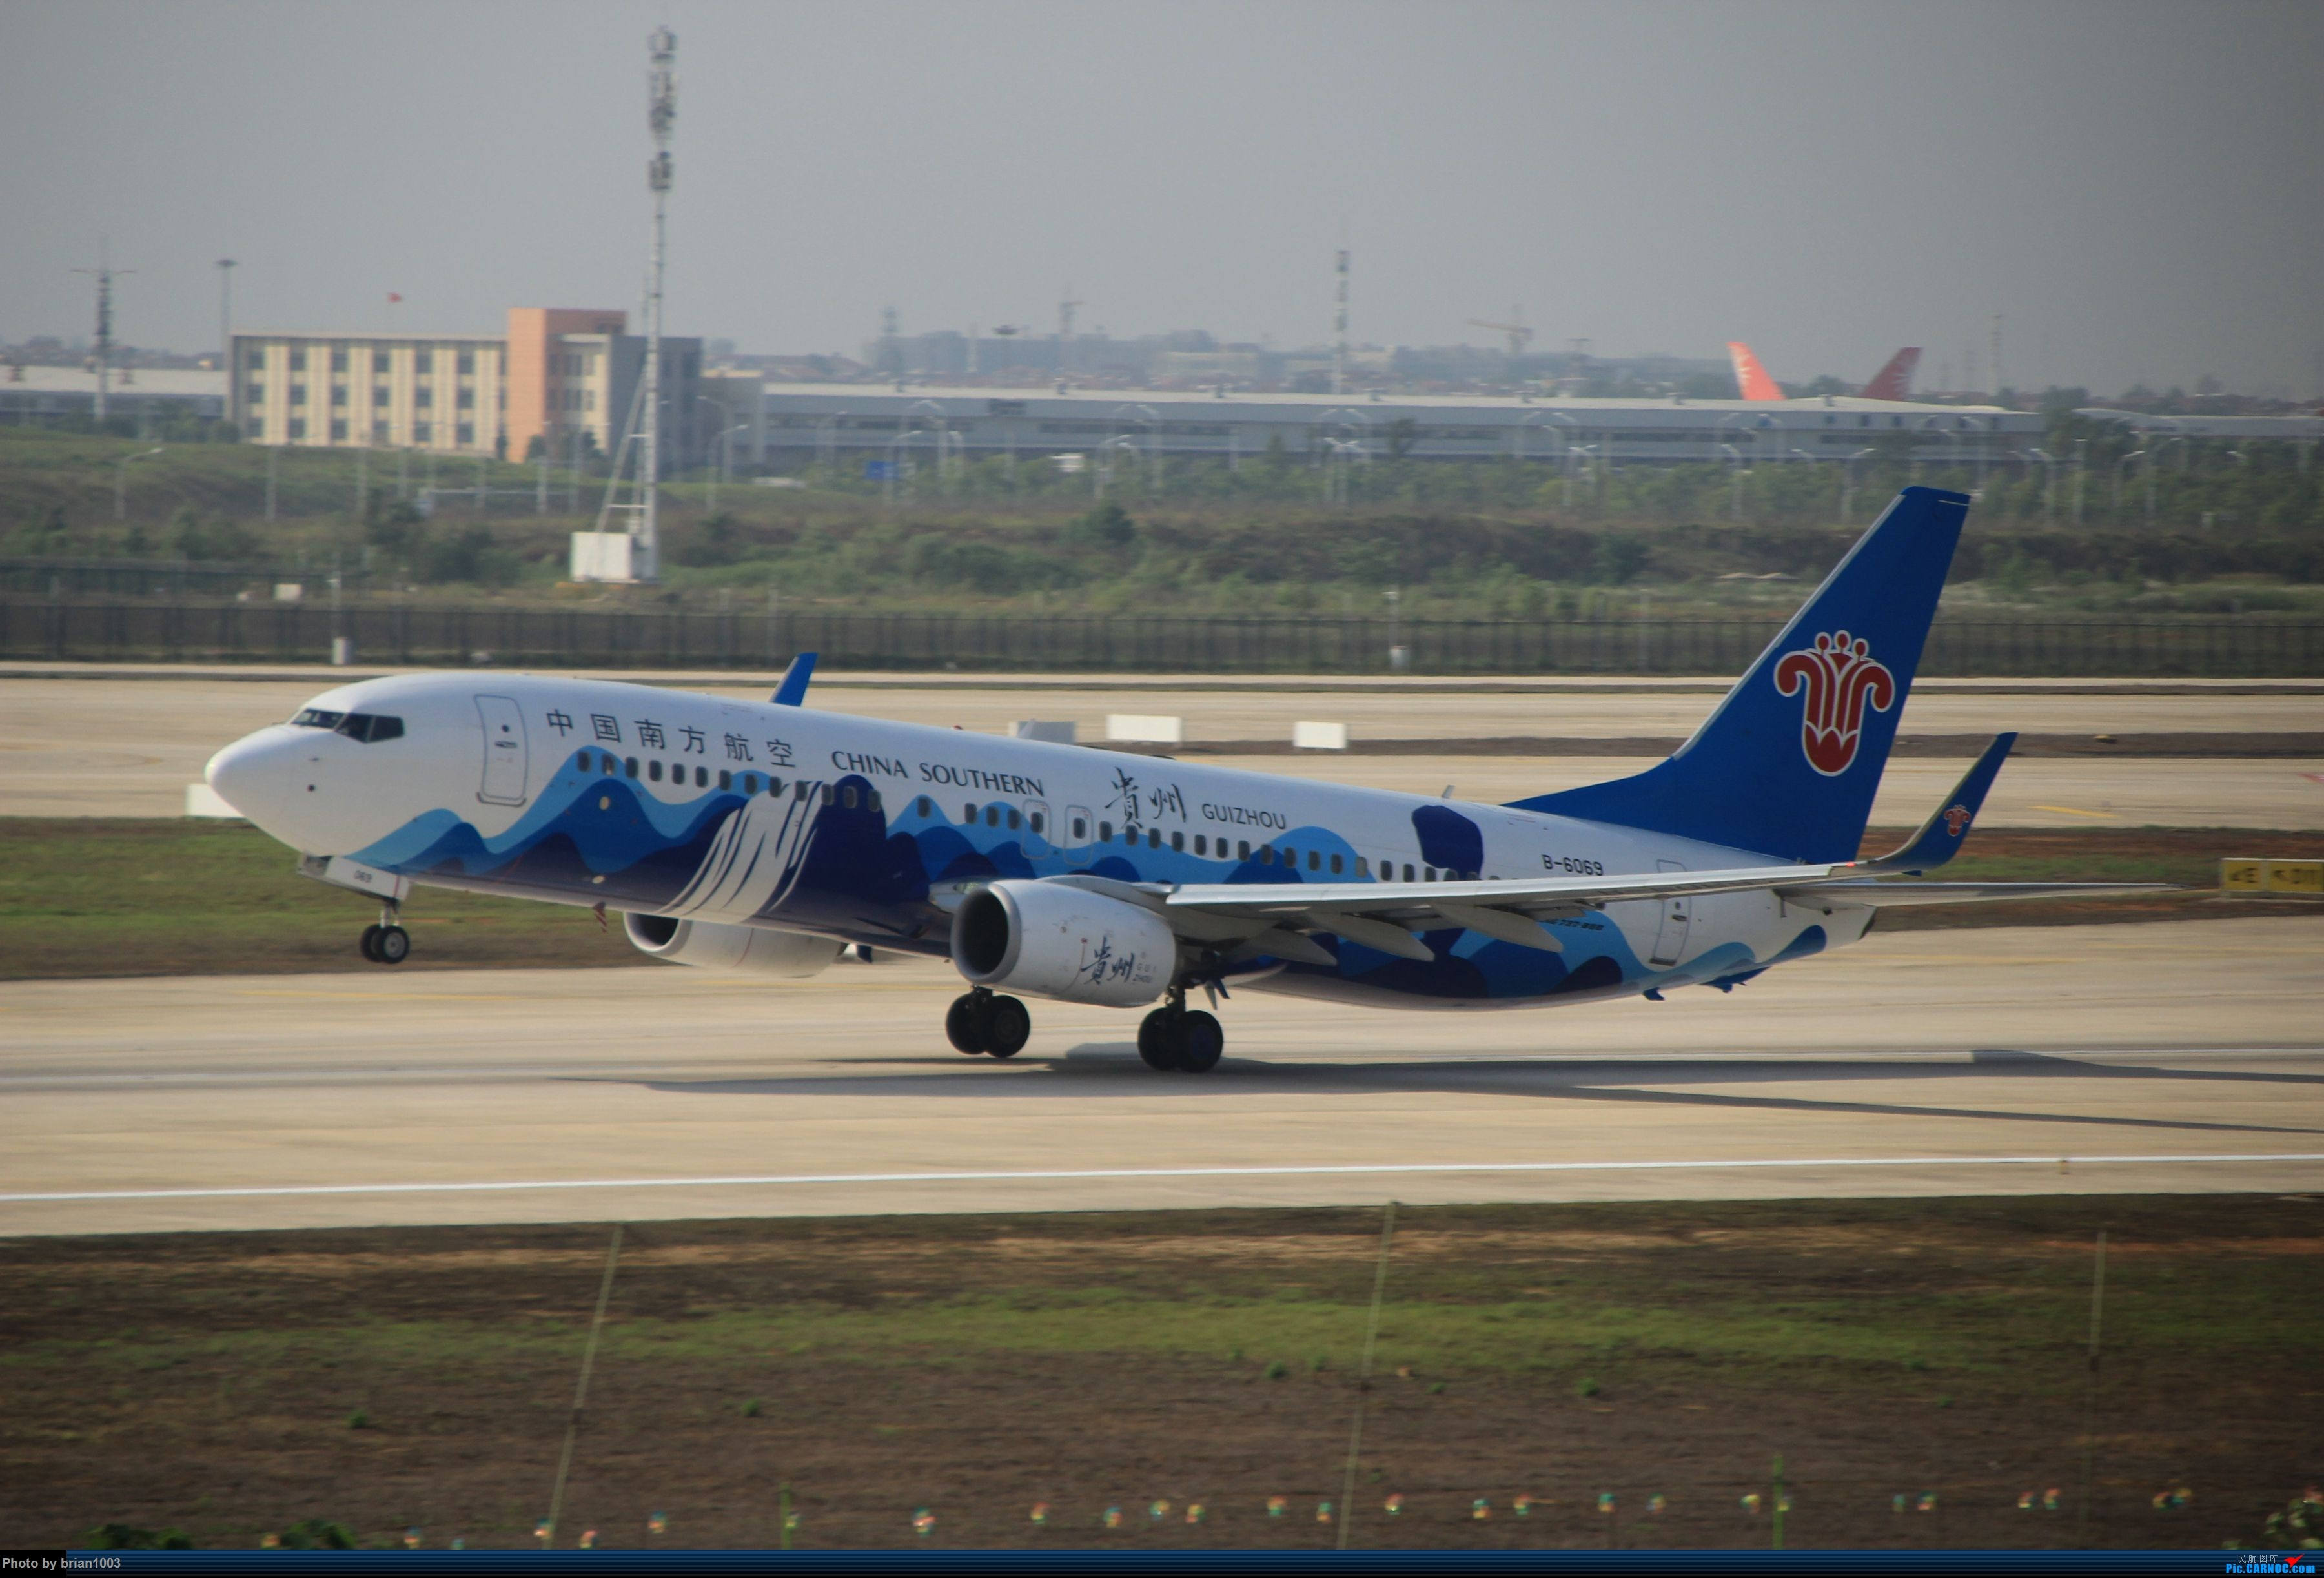 Re:[原创]WUH武汉天河机场拍机之喜迎酷航788和偶遇某其他飞机 BOEING 737-800 B-6069 WUH